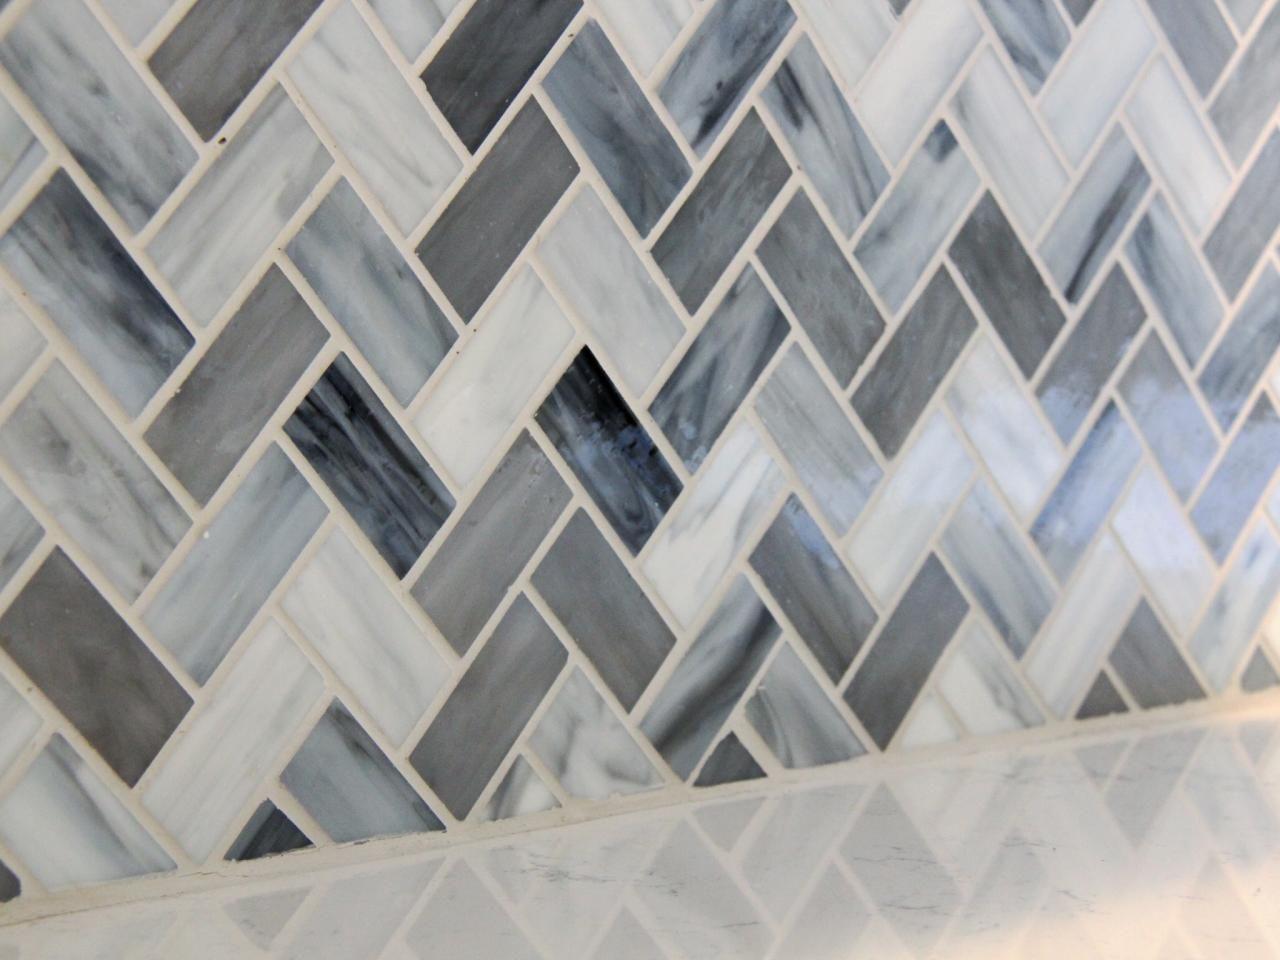 The chevron glass mosaic backsplash in varying hues of blue and gray kitchen backsplash dailygadgetfo Image collections